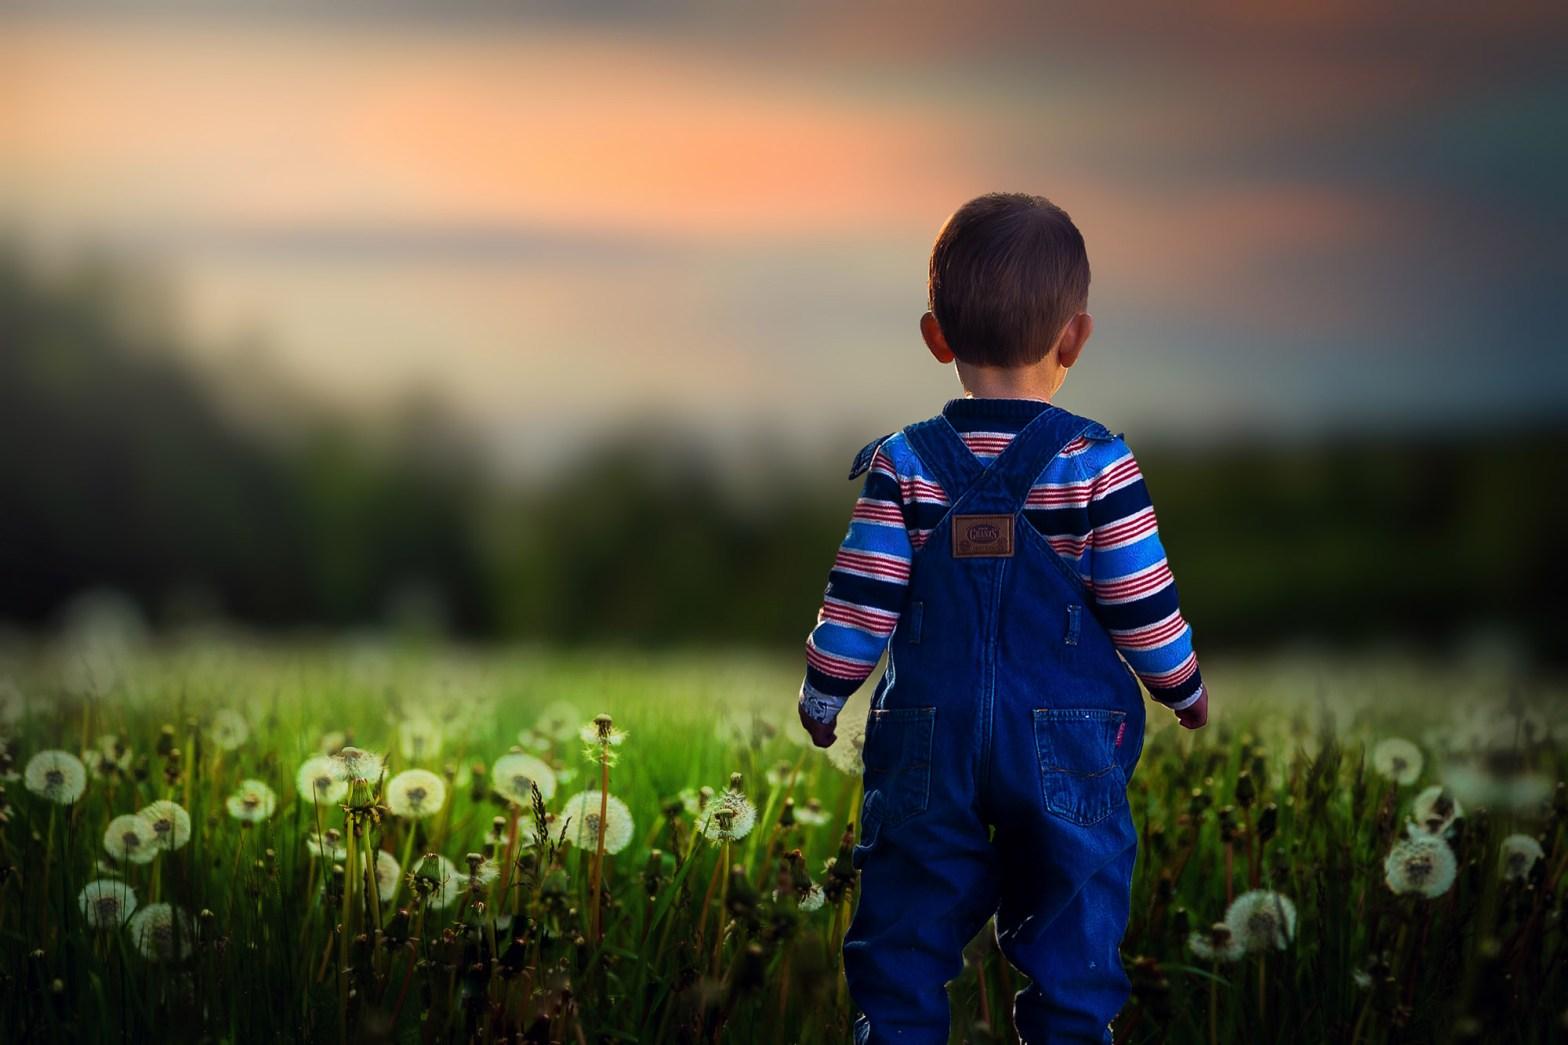 liten pojke står bland maskrosor vid ett fält i solnedgången